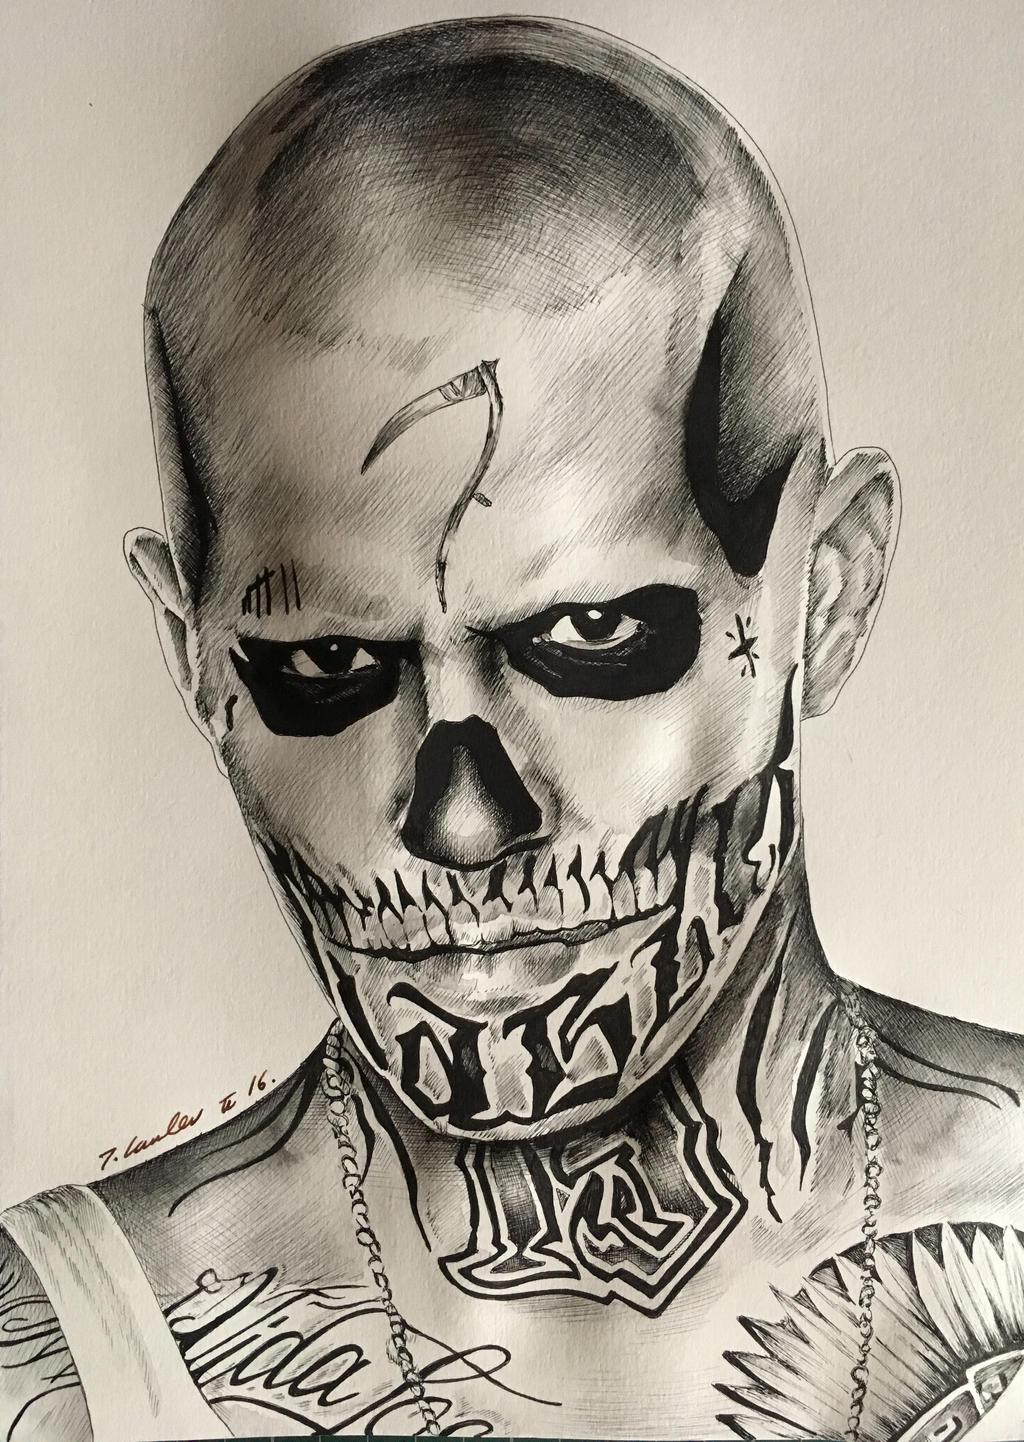 El Diablo Suicide Squad art by billyboyuk on DeviantArt